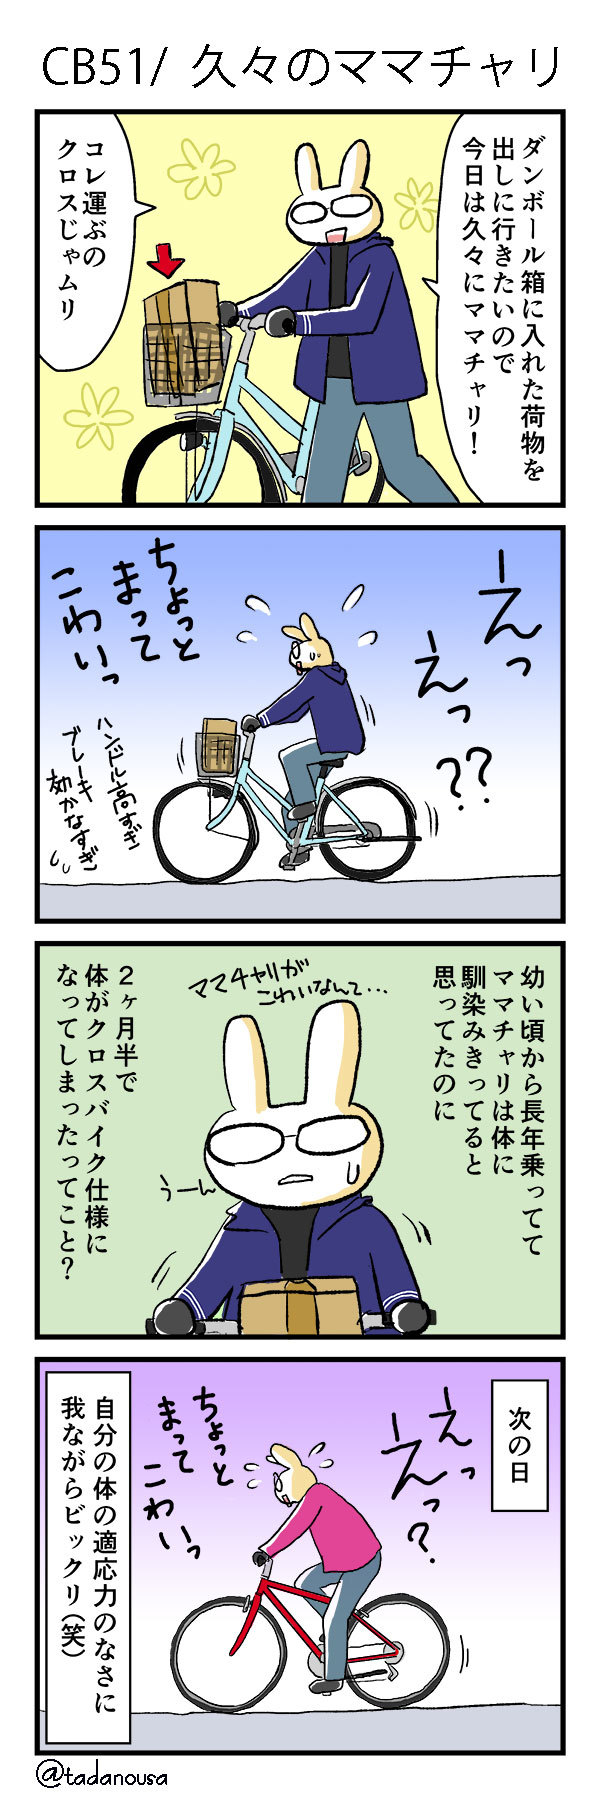 bike_4koma_kako091_s.jpg